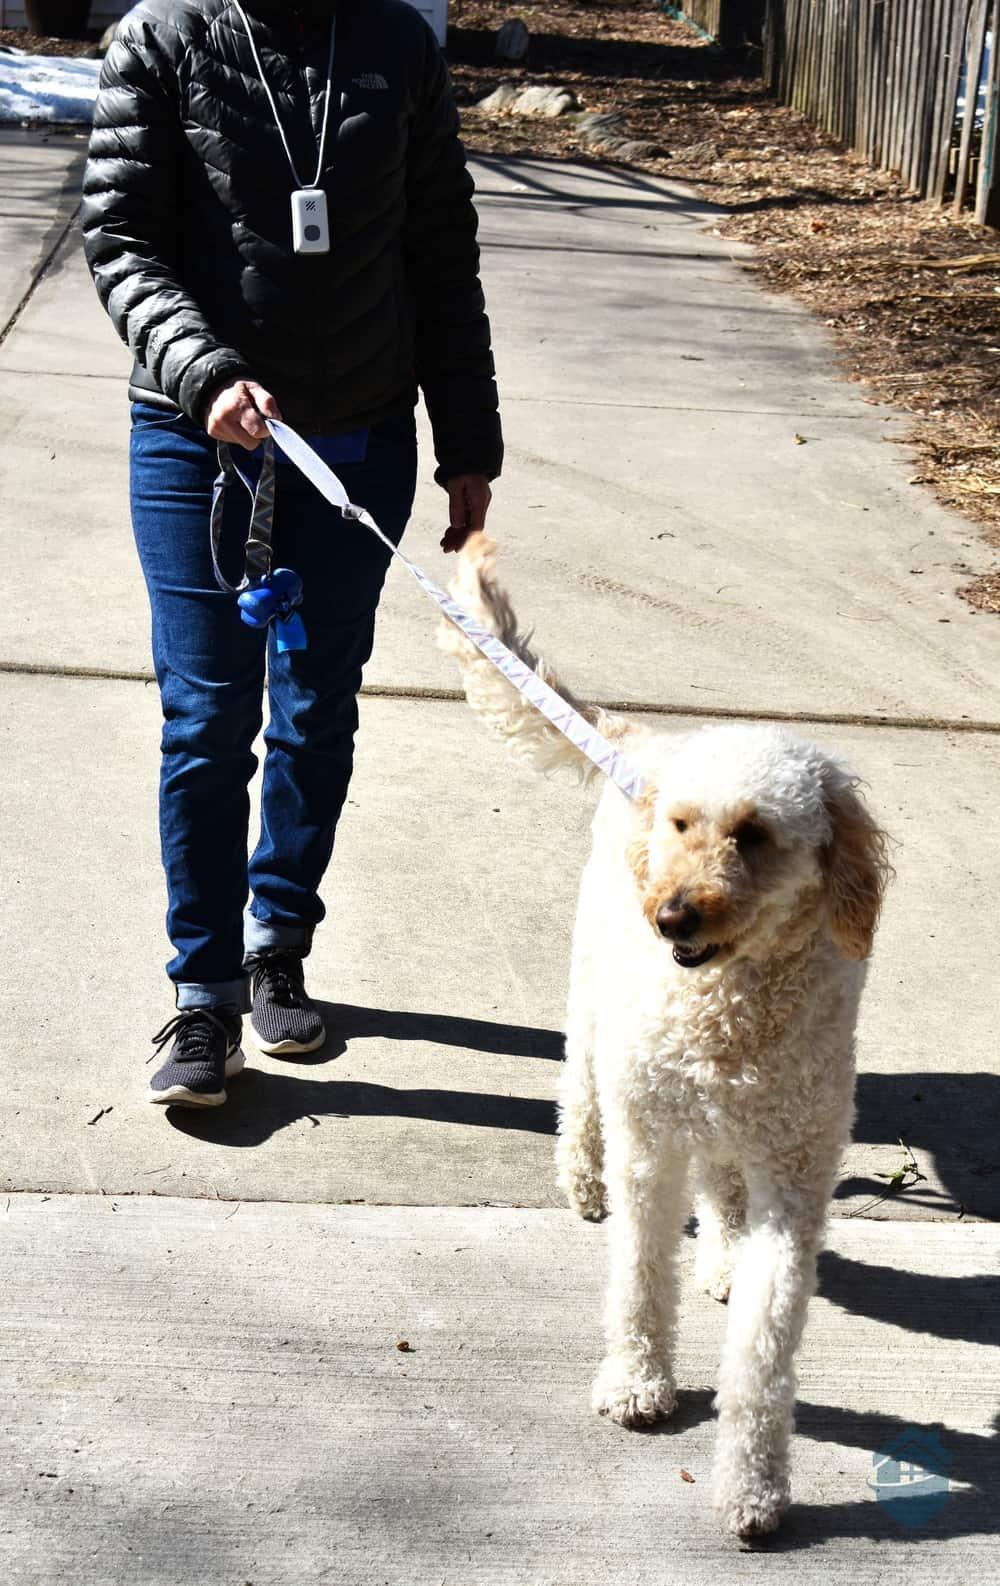 Wearing LifeStation while walking the dog